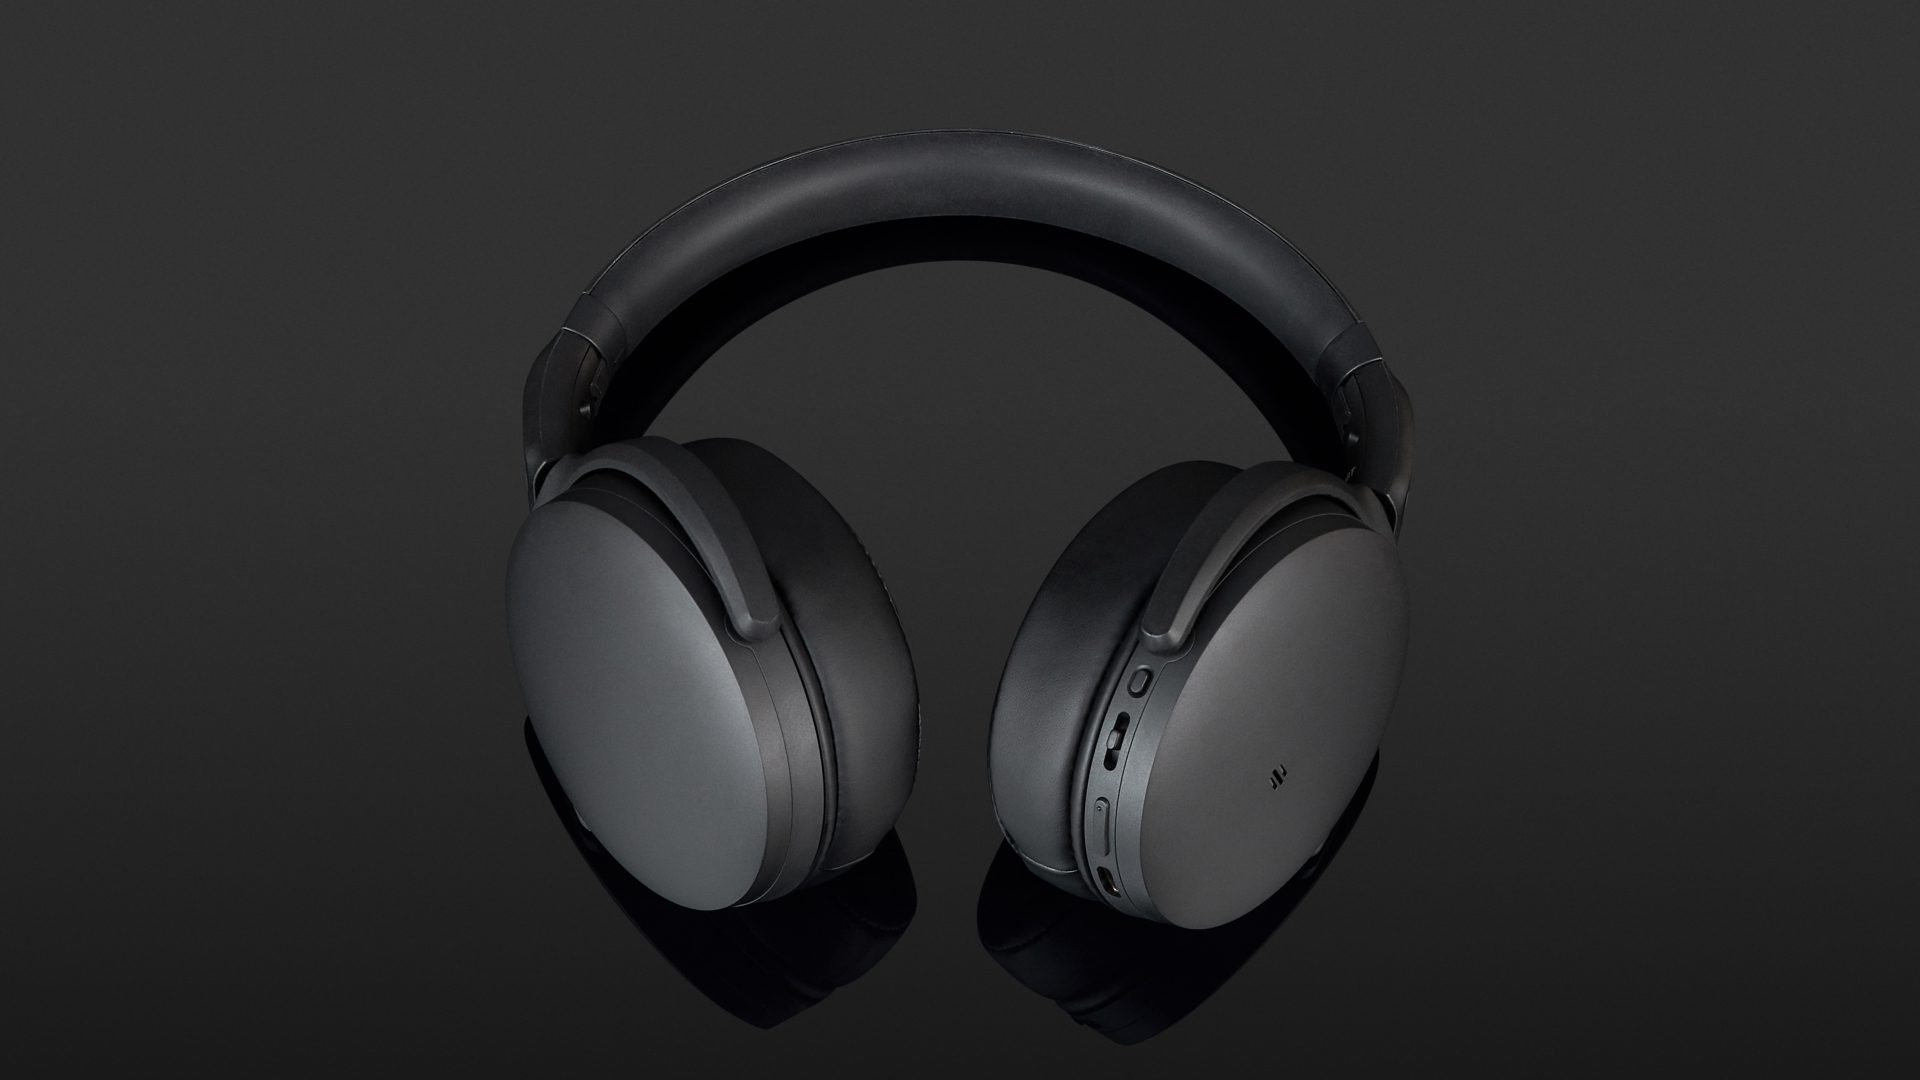 https://www.headphonecheck.com/wp-content/uploads/tps_1335_482604_January05153-482604-1920x1080.jpg